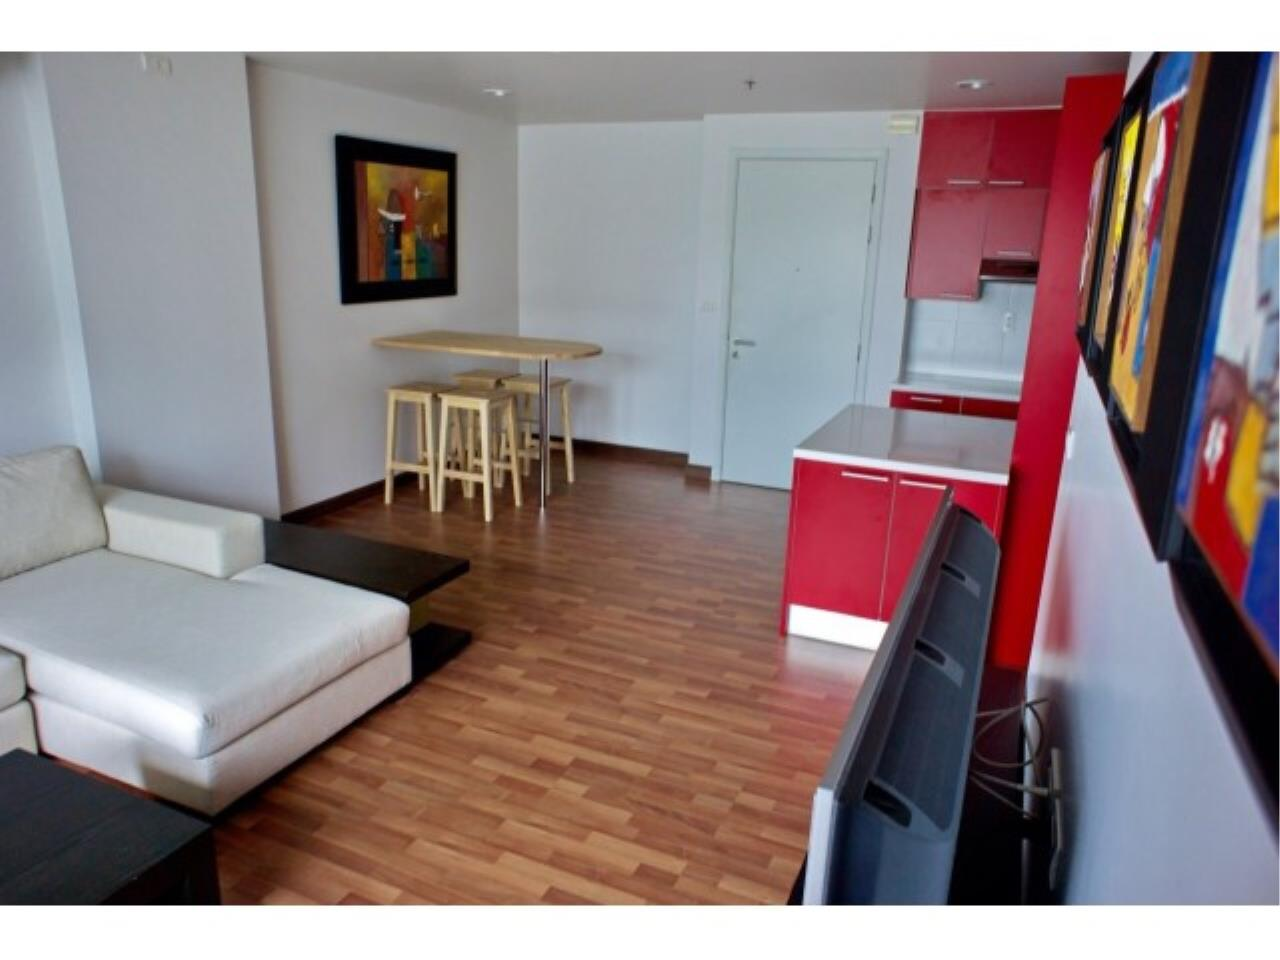 You Estate Agency's Sale Centric scene paholyathin 9, 59 sq.m Ari BTS 3